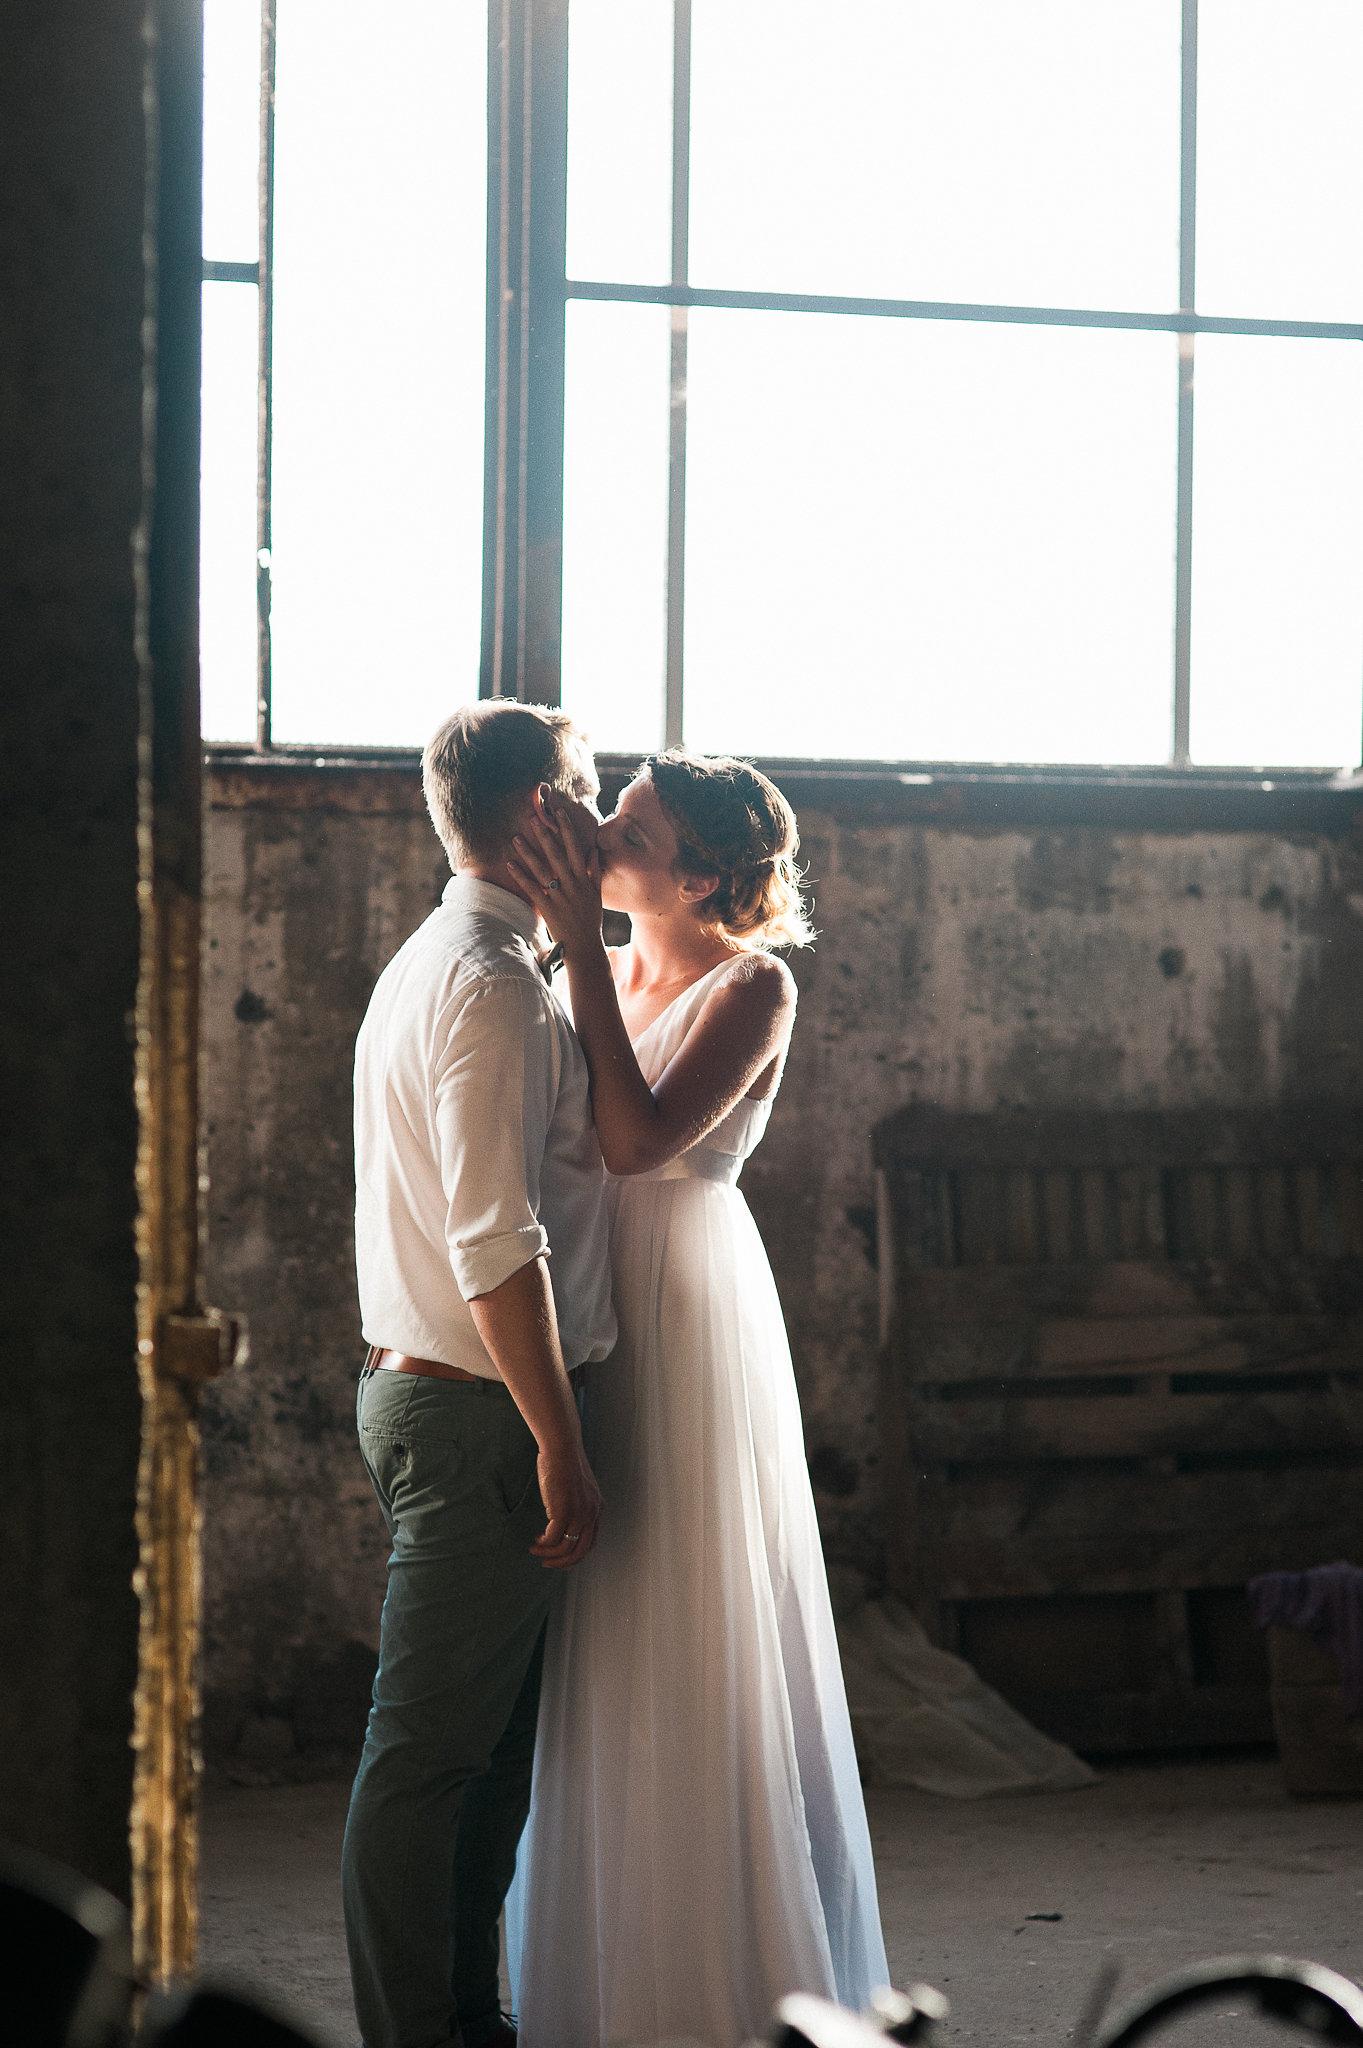 concours-funky-wedding-combi-volkswagen-vintage-crest-la-boheme (6)